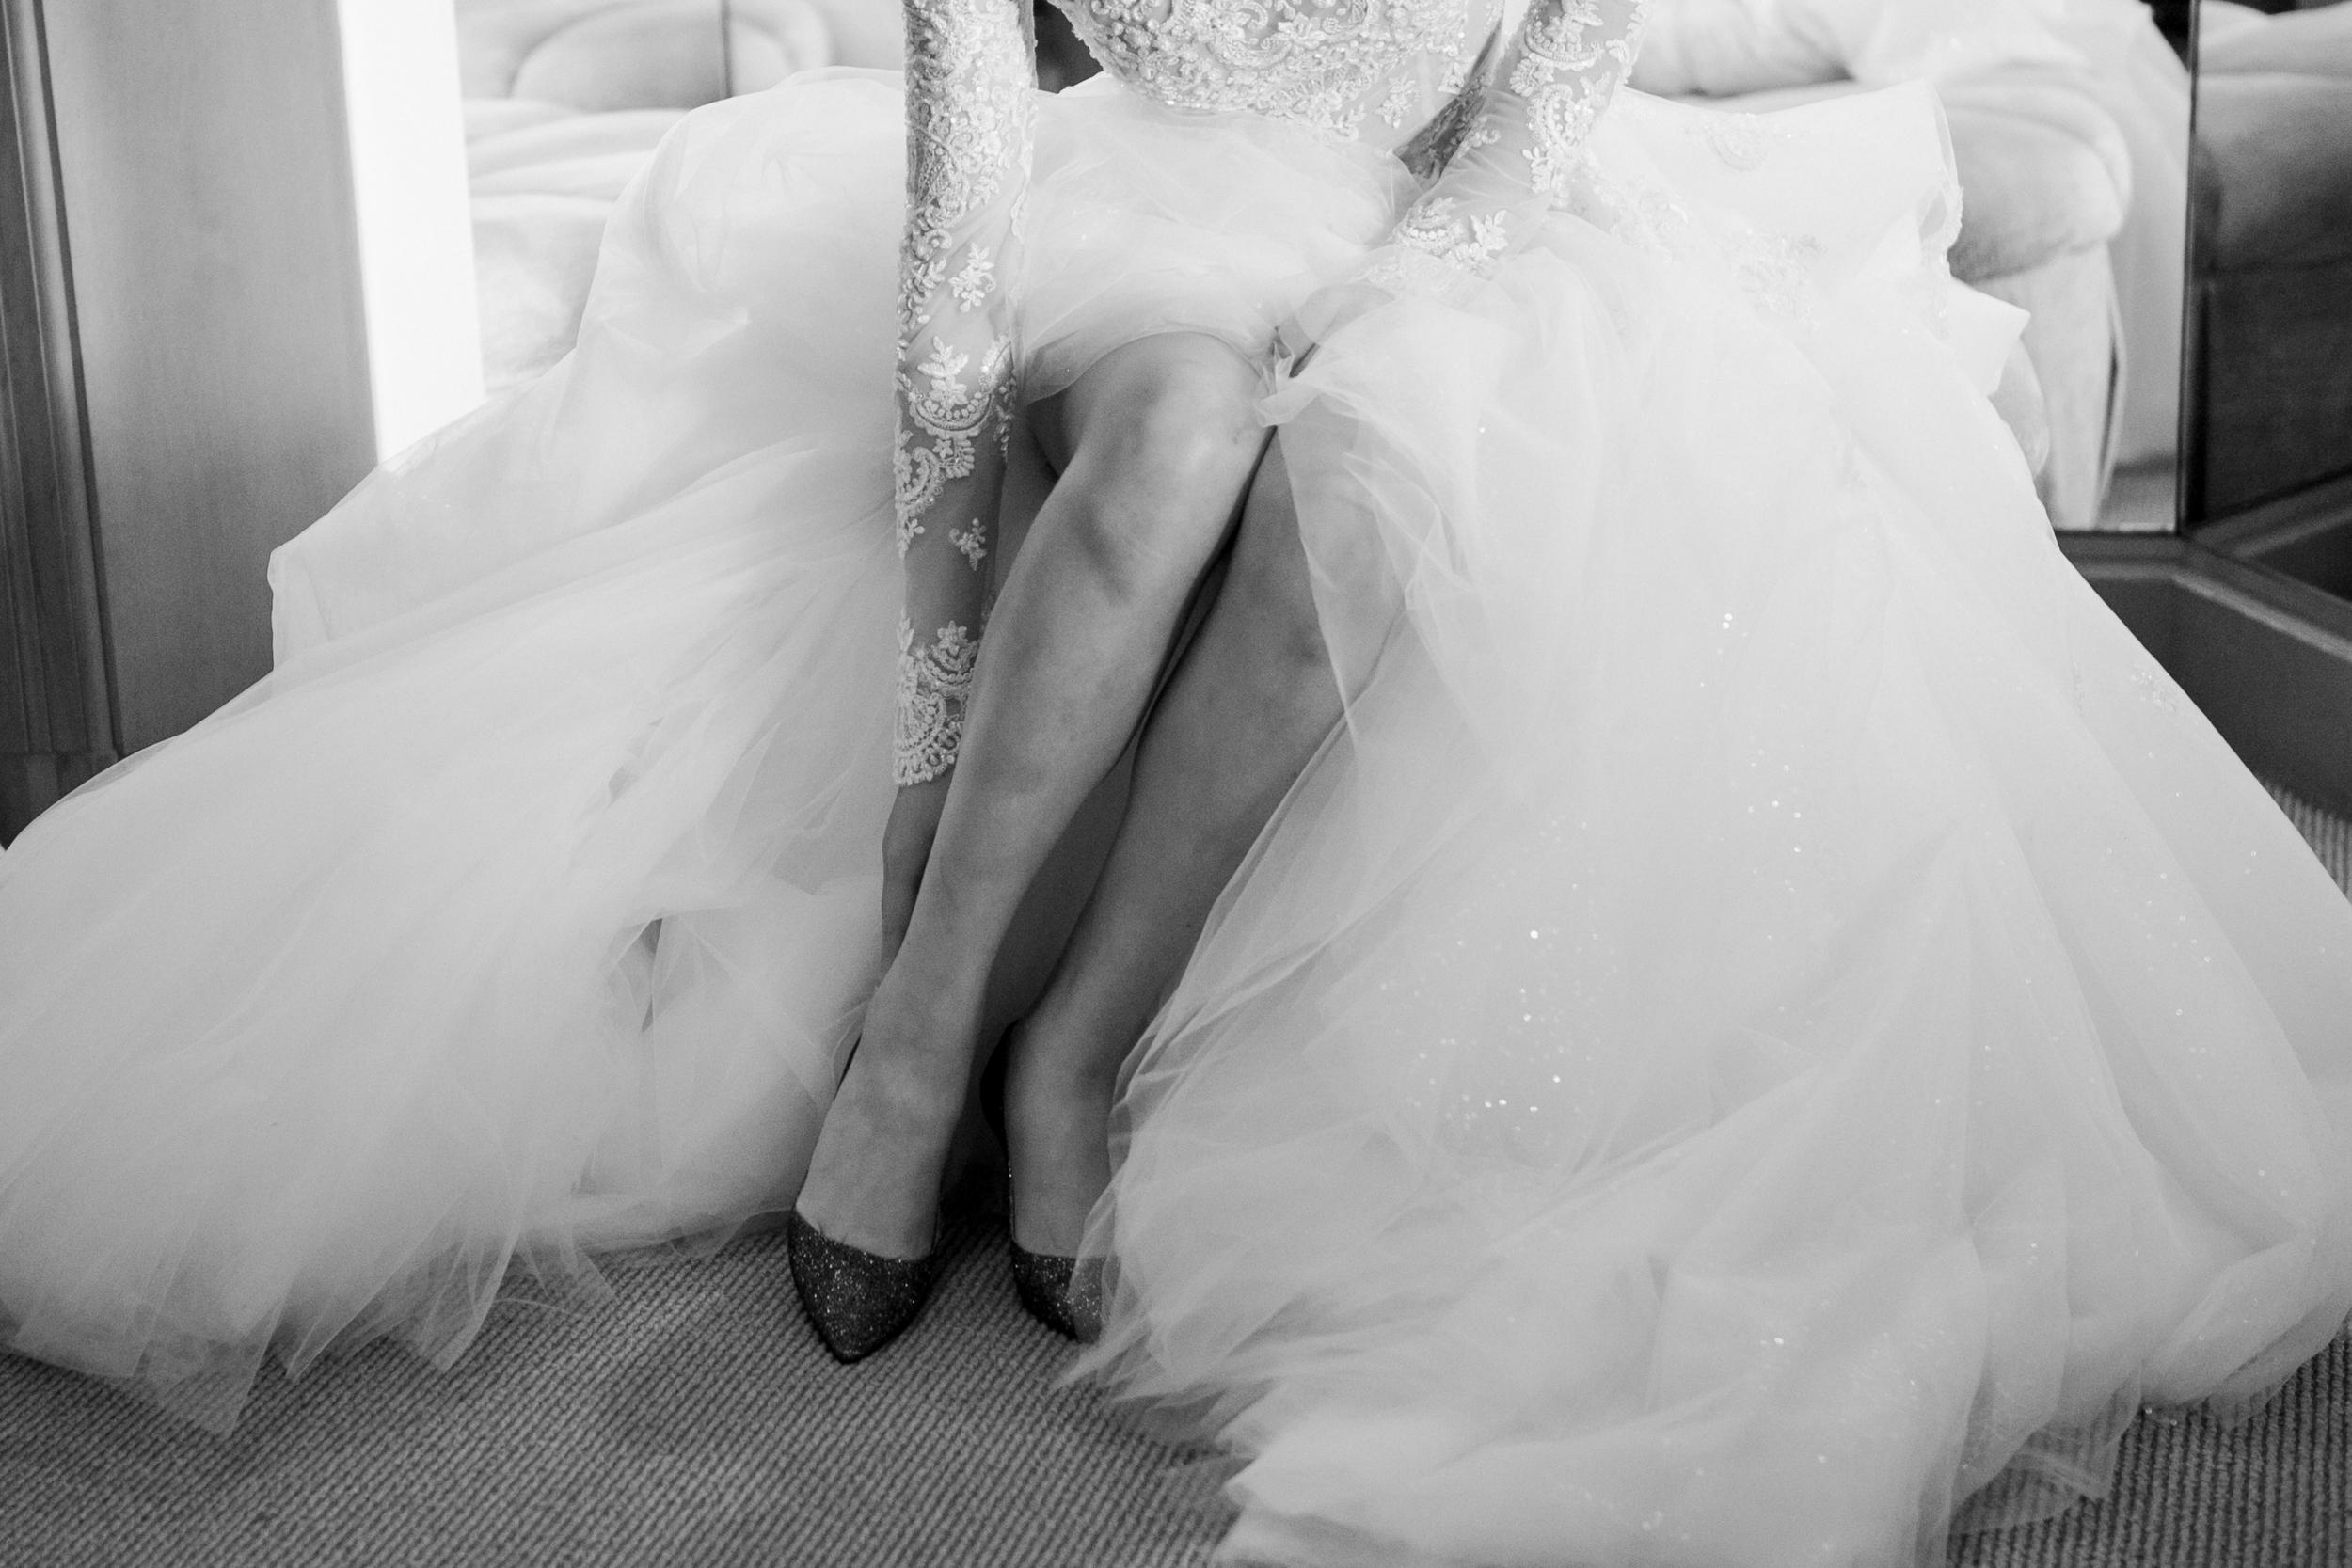 J. Lee Photos Wedding Photographer